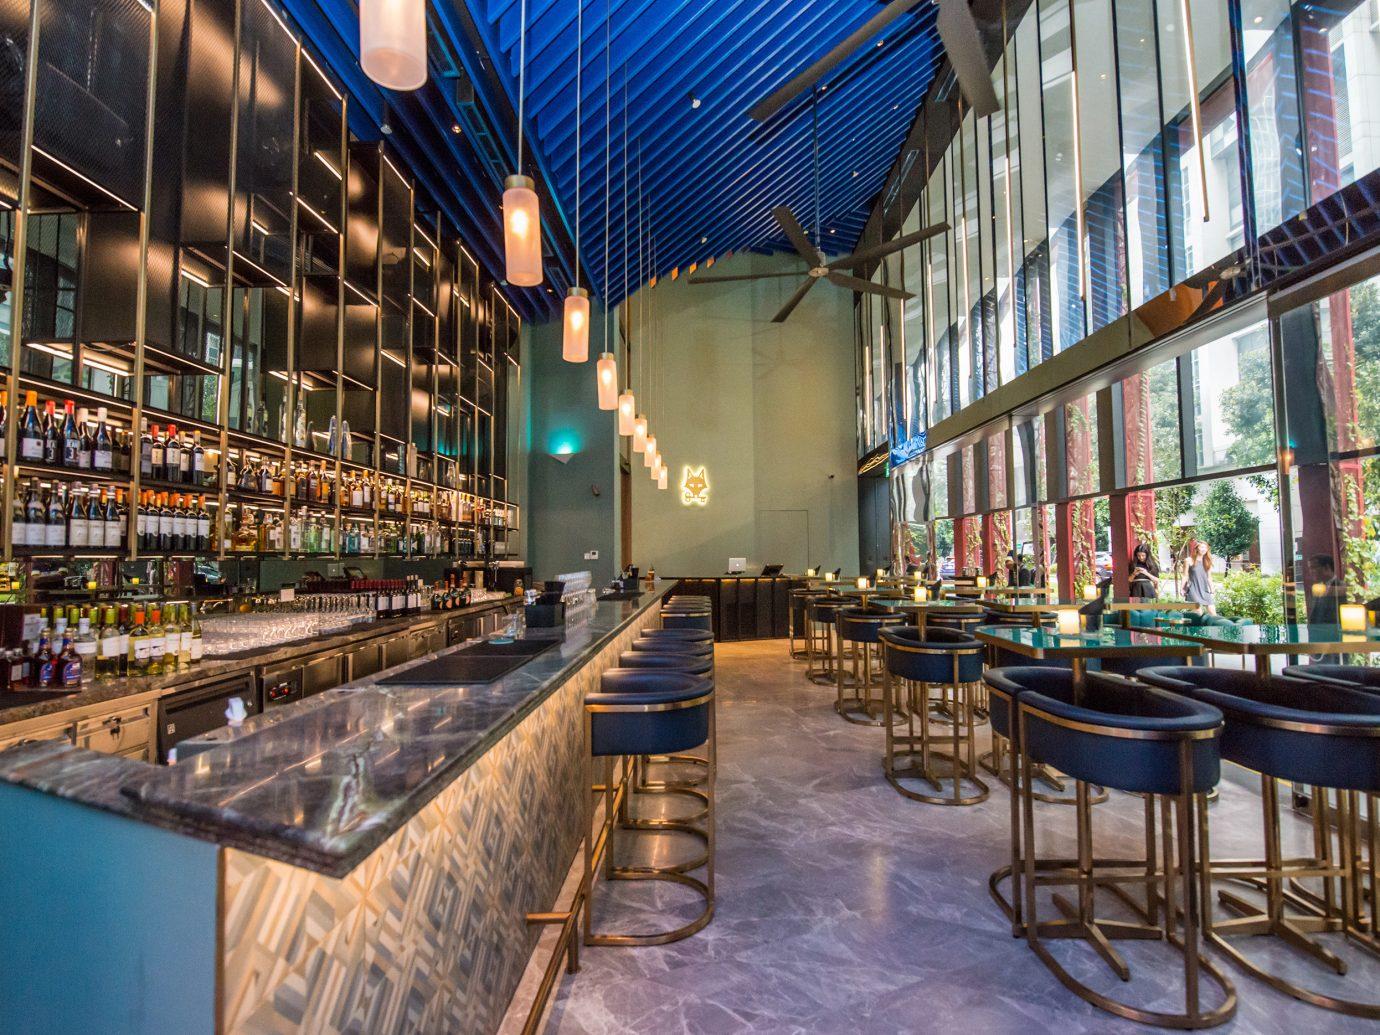 Hotels building restaurant Bar interior design convention center